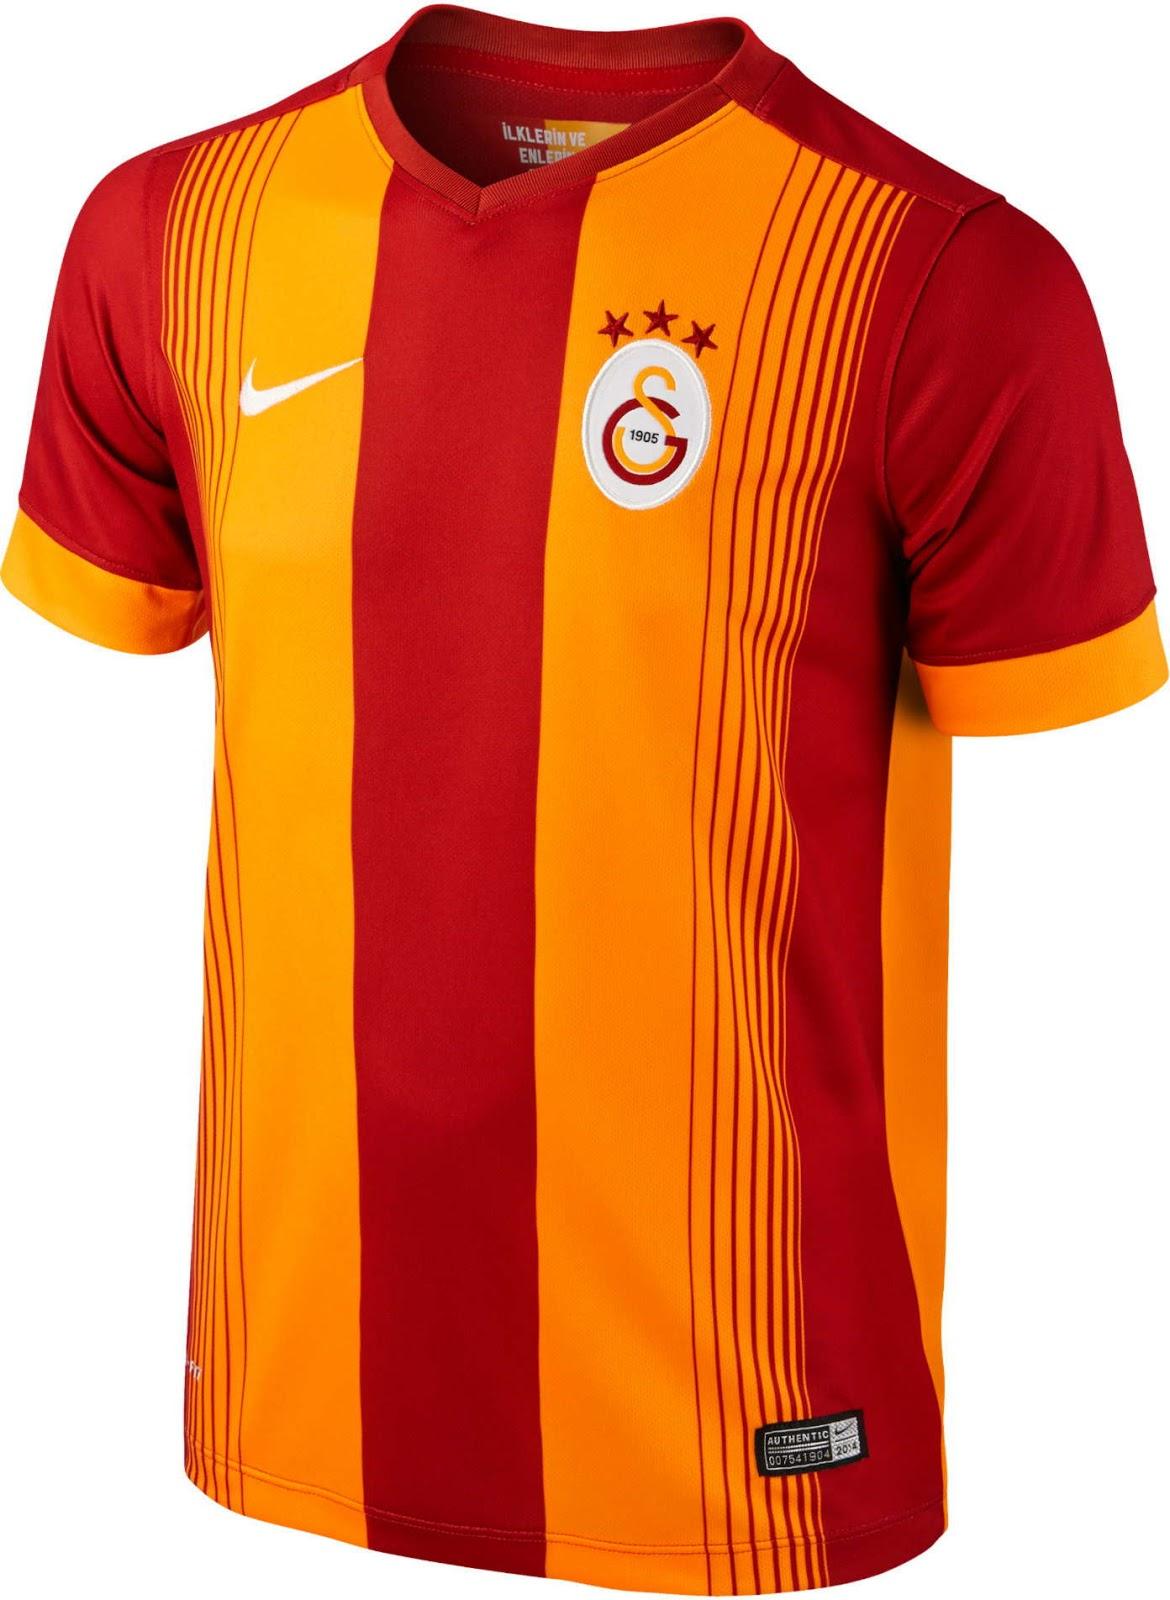 Galatasaray 14-15 Kits Released